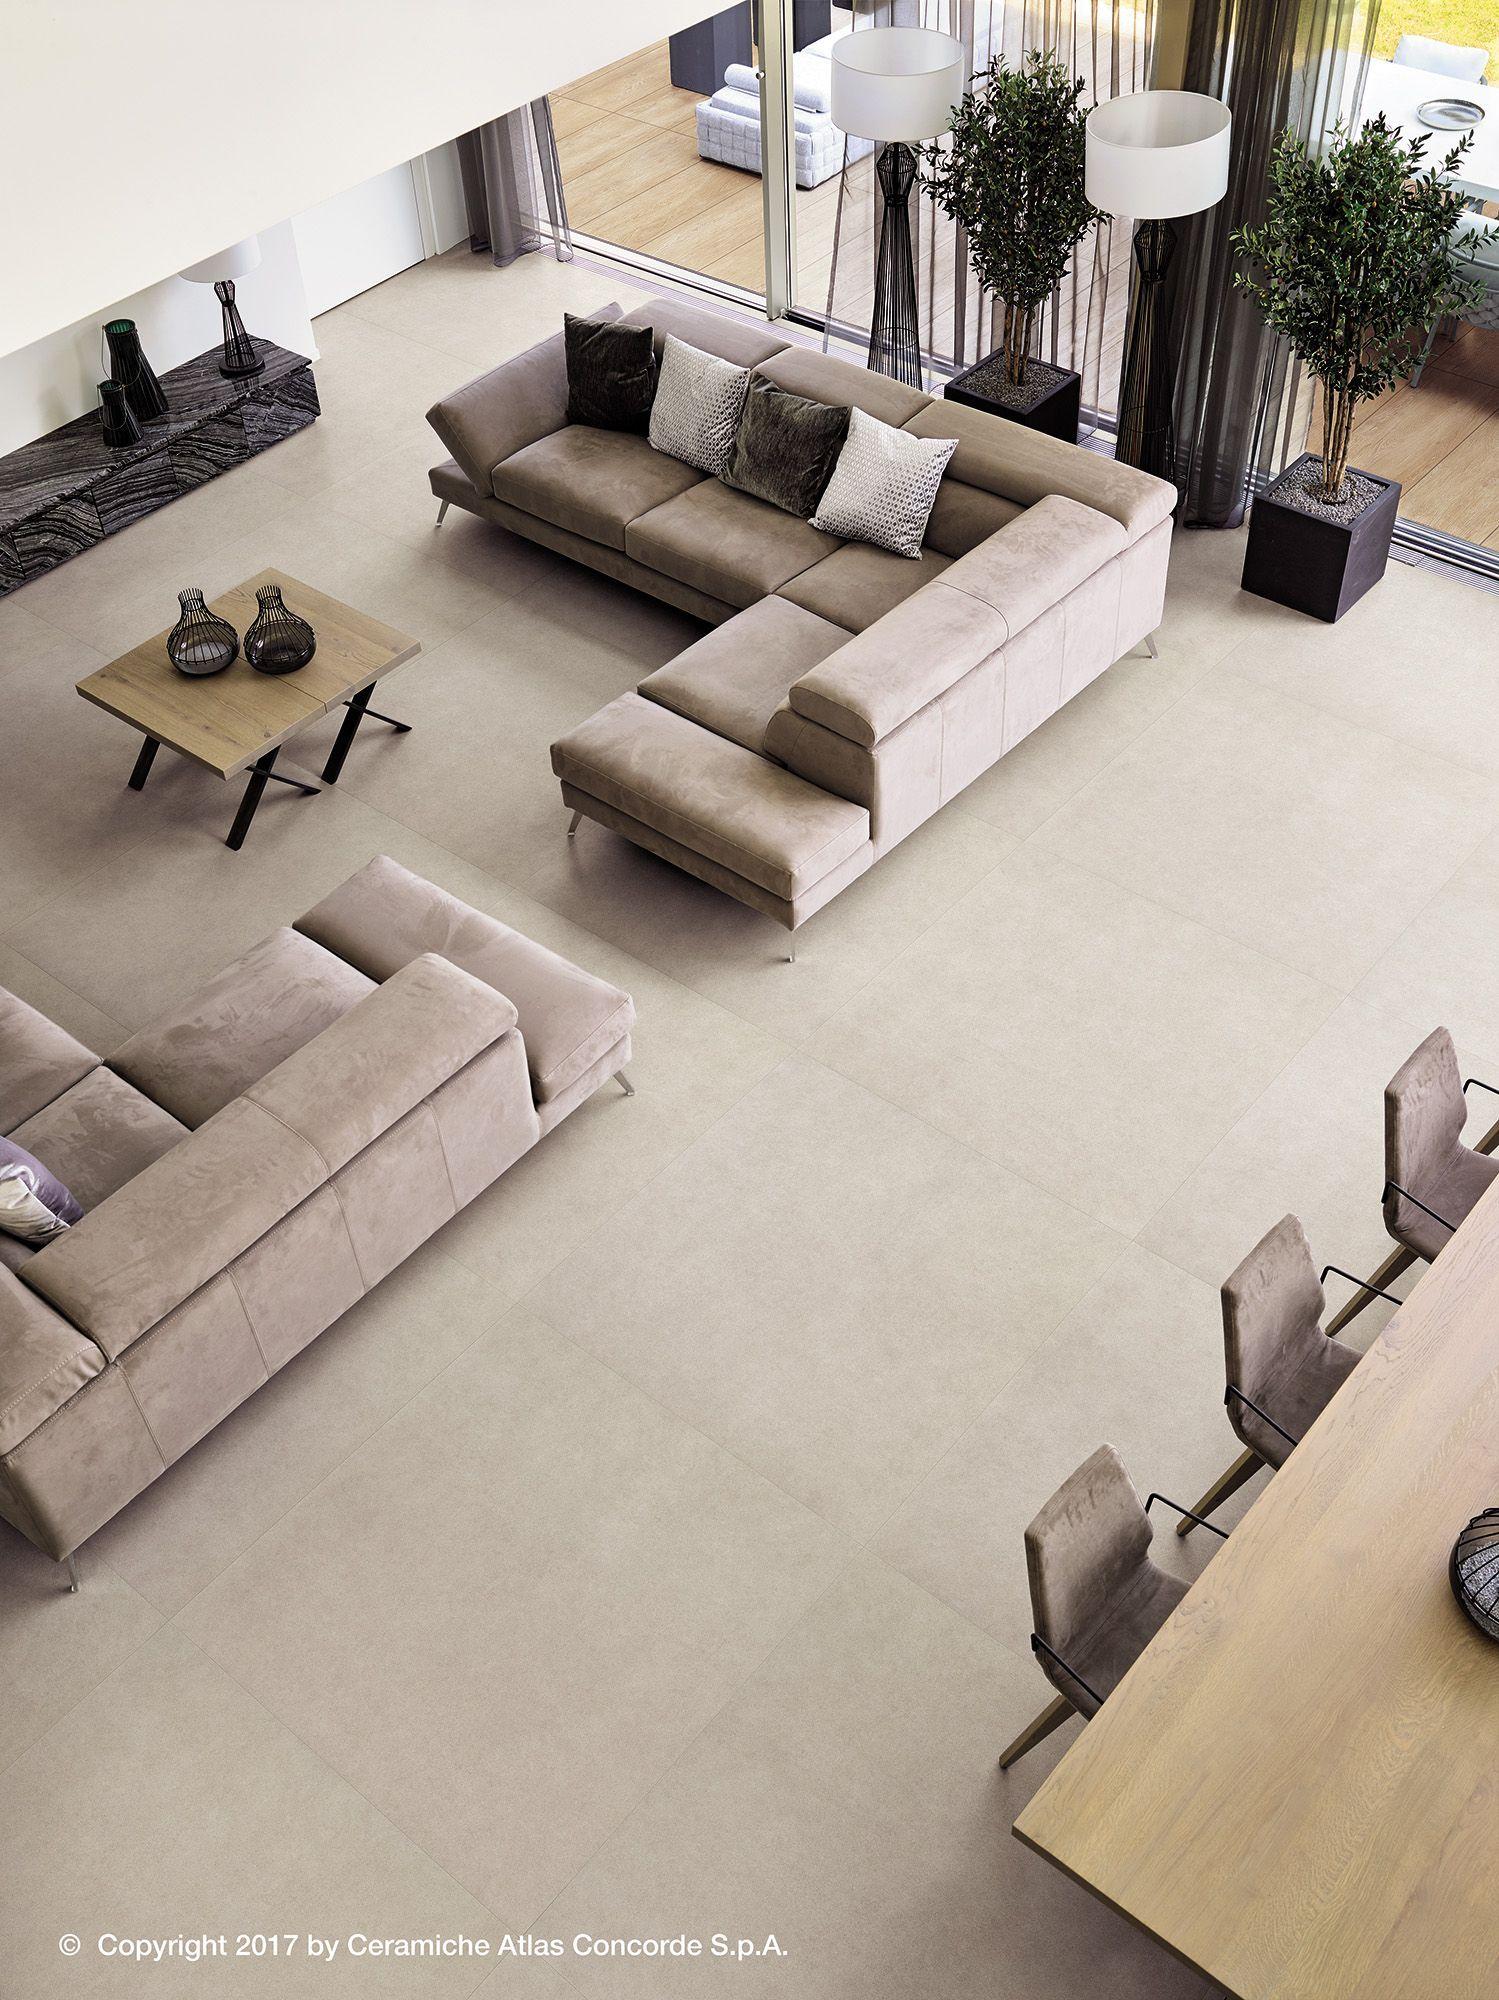 Concrete Inspired Flooring For Home Design In 2020 Living Room